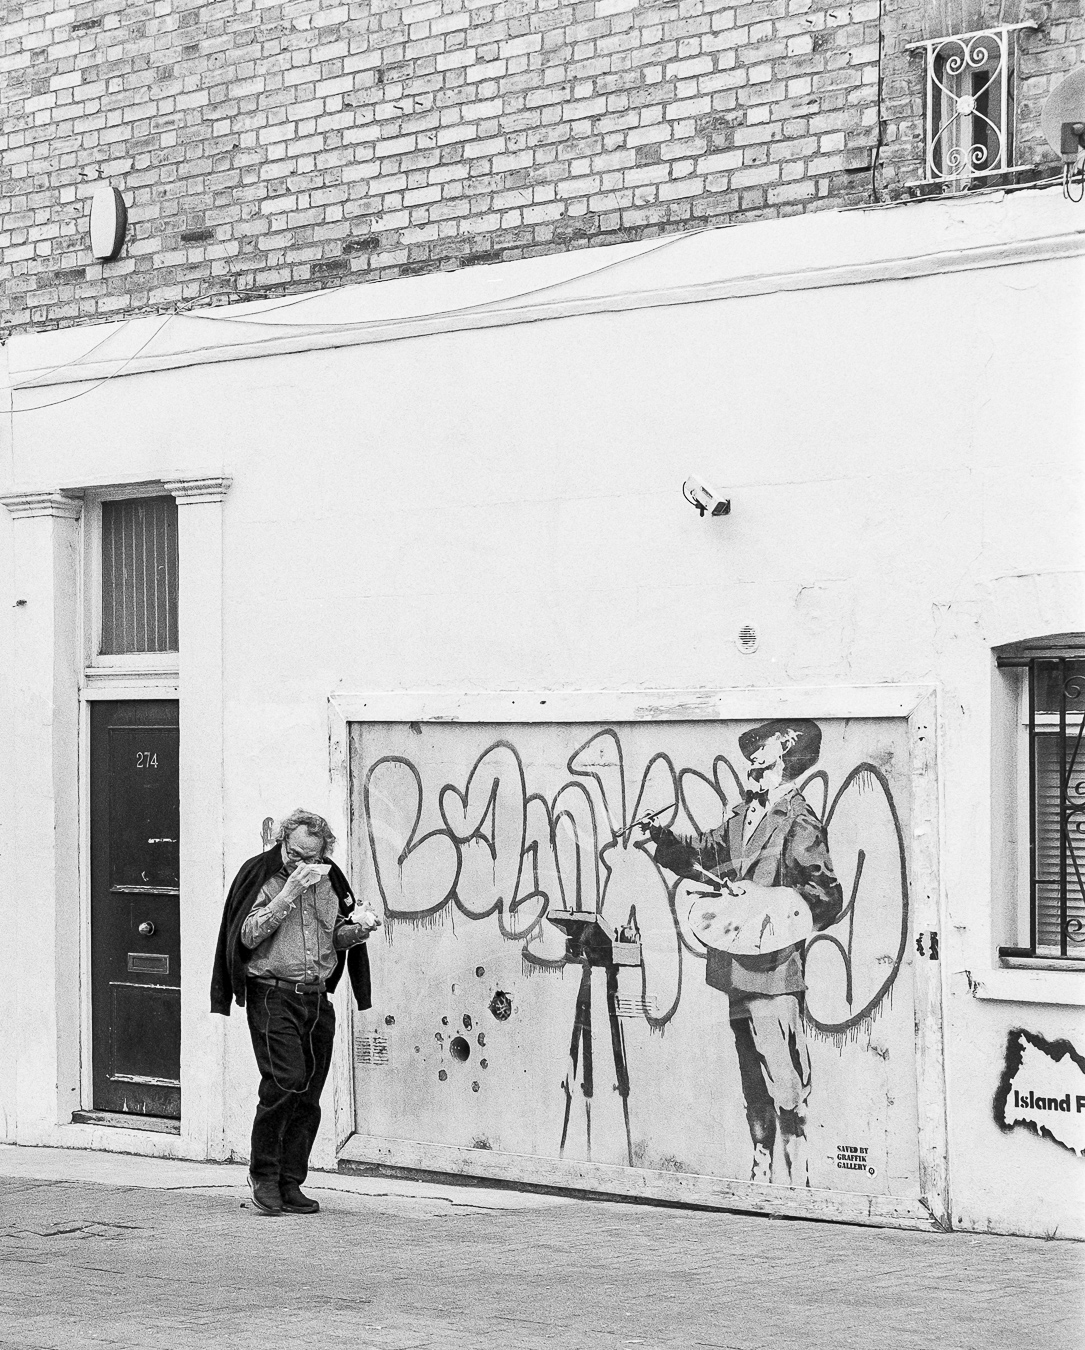 Banksy's 'Graffiti Painter', Cambridge Gardens, London - ARTVISIT